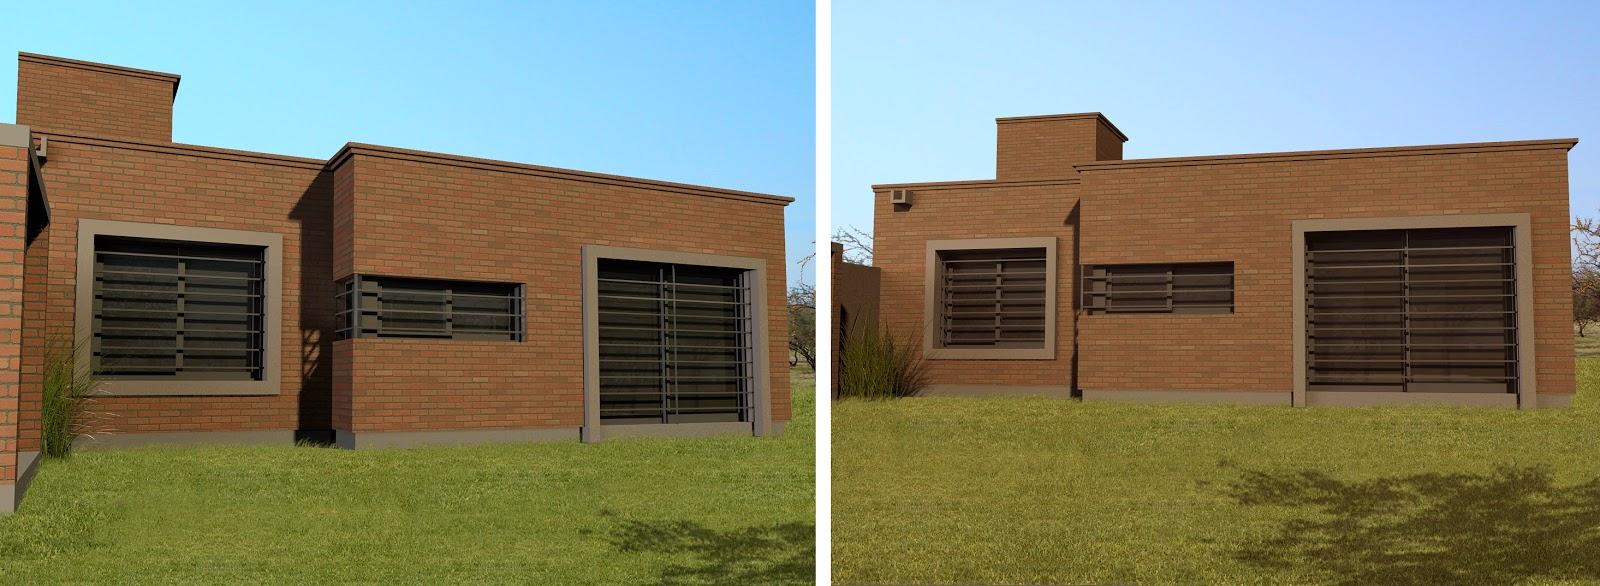 B B Arquitectura Arquitectura Residencial Vivienda Fg